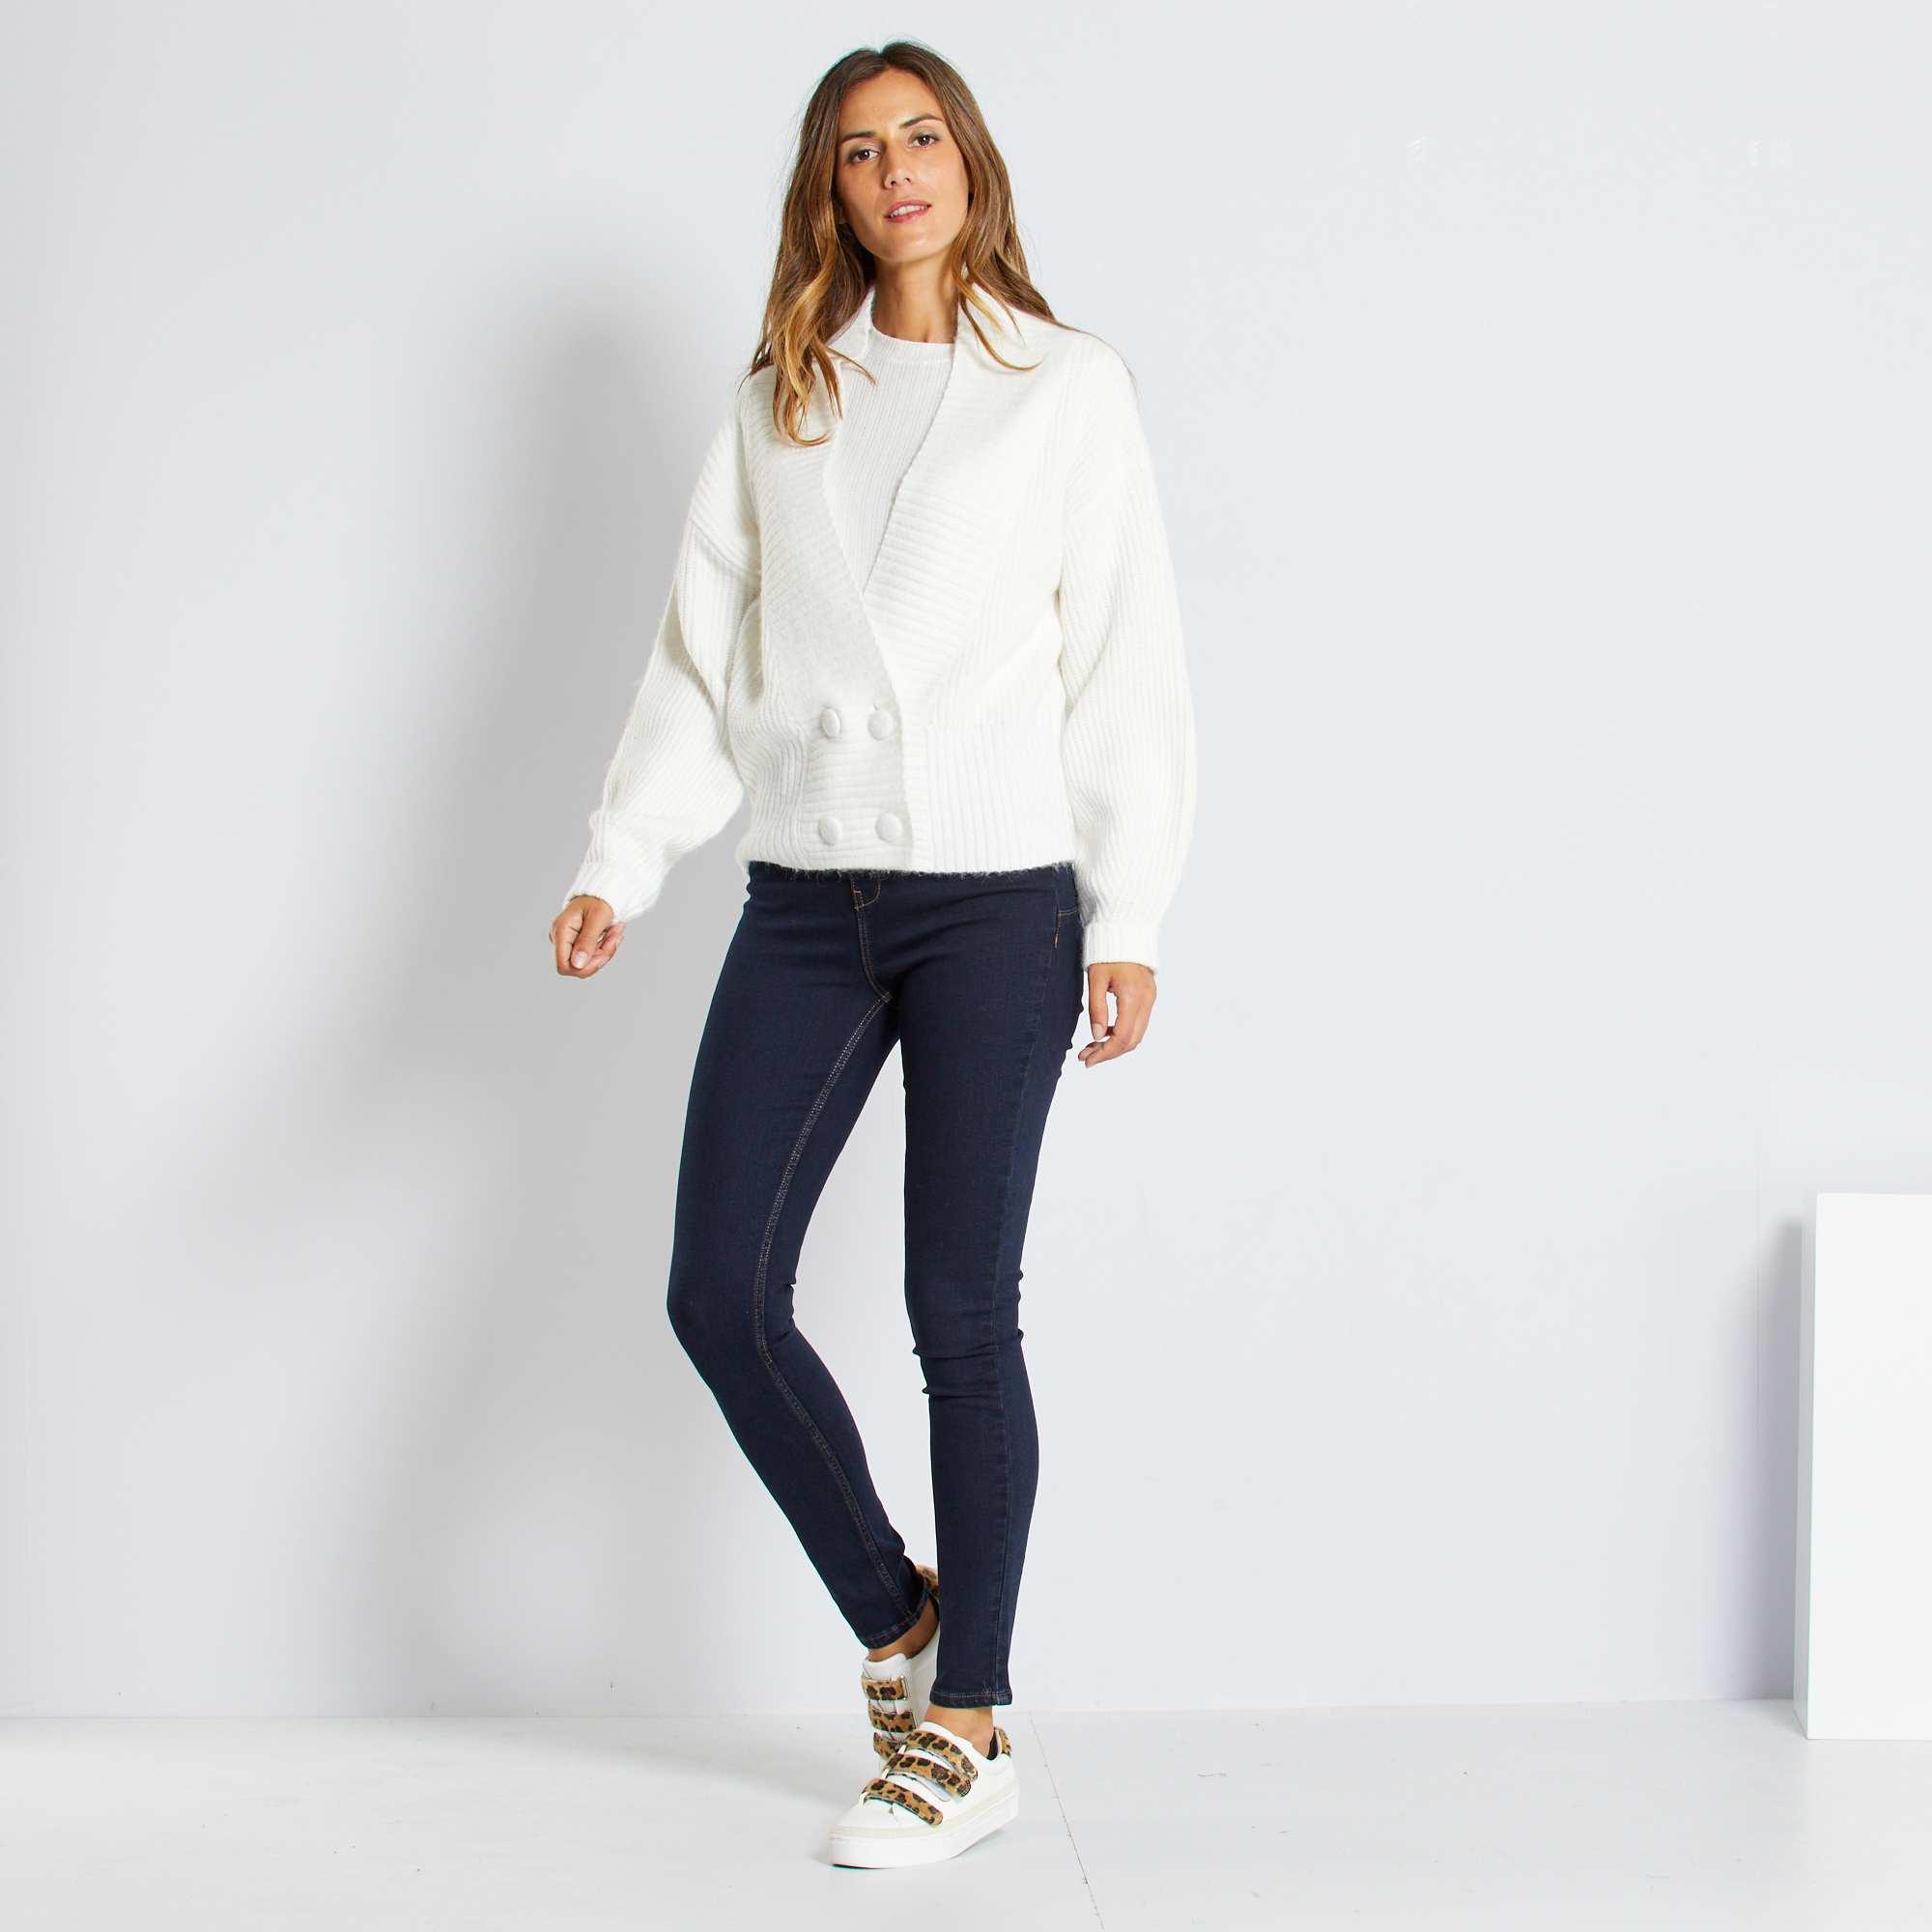 jean skinny taille haute longueur us 30 femme rinse kiabi 15 00. Black Bedroom Furniture Sets. Home Design Ideas